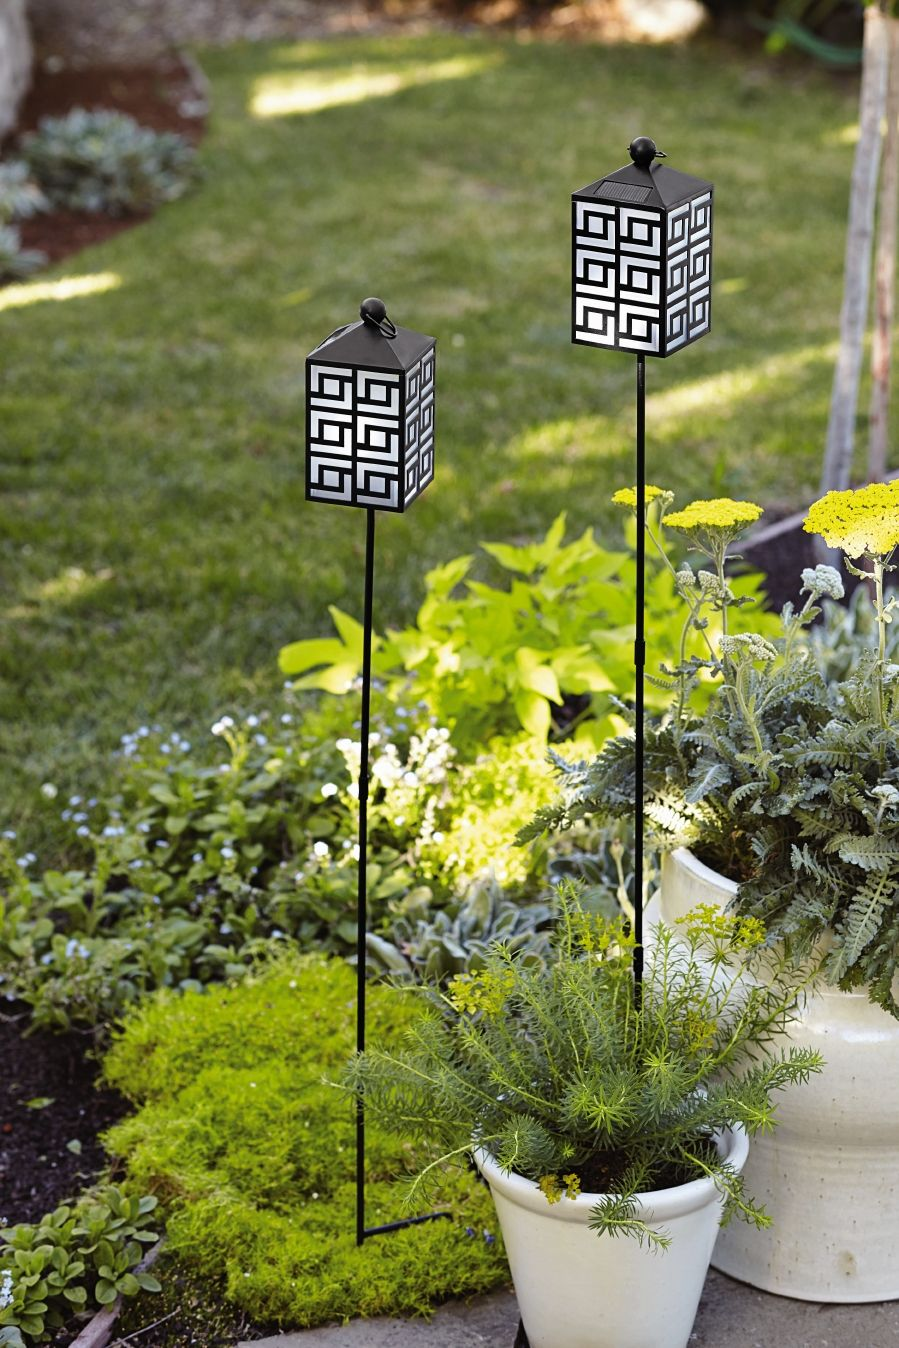 Light up the garden with solar-powered outdoor decor | Summer - 2014 ...